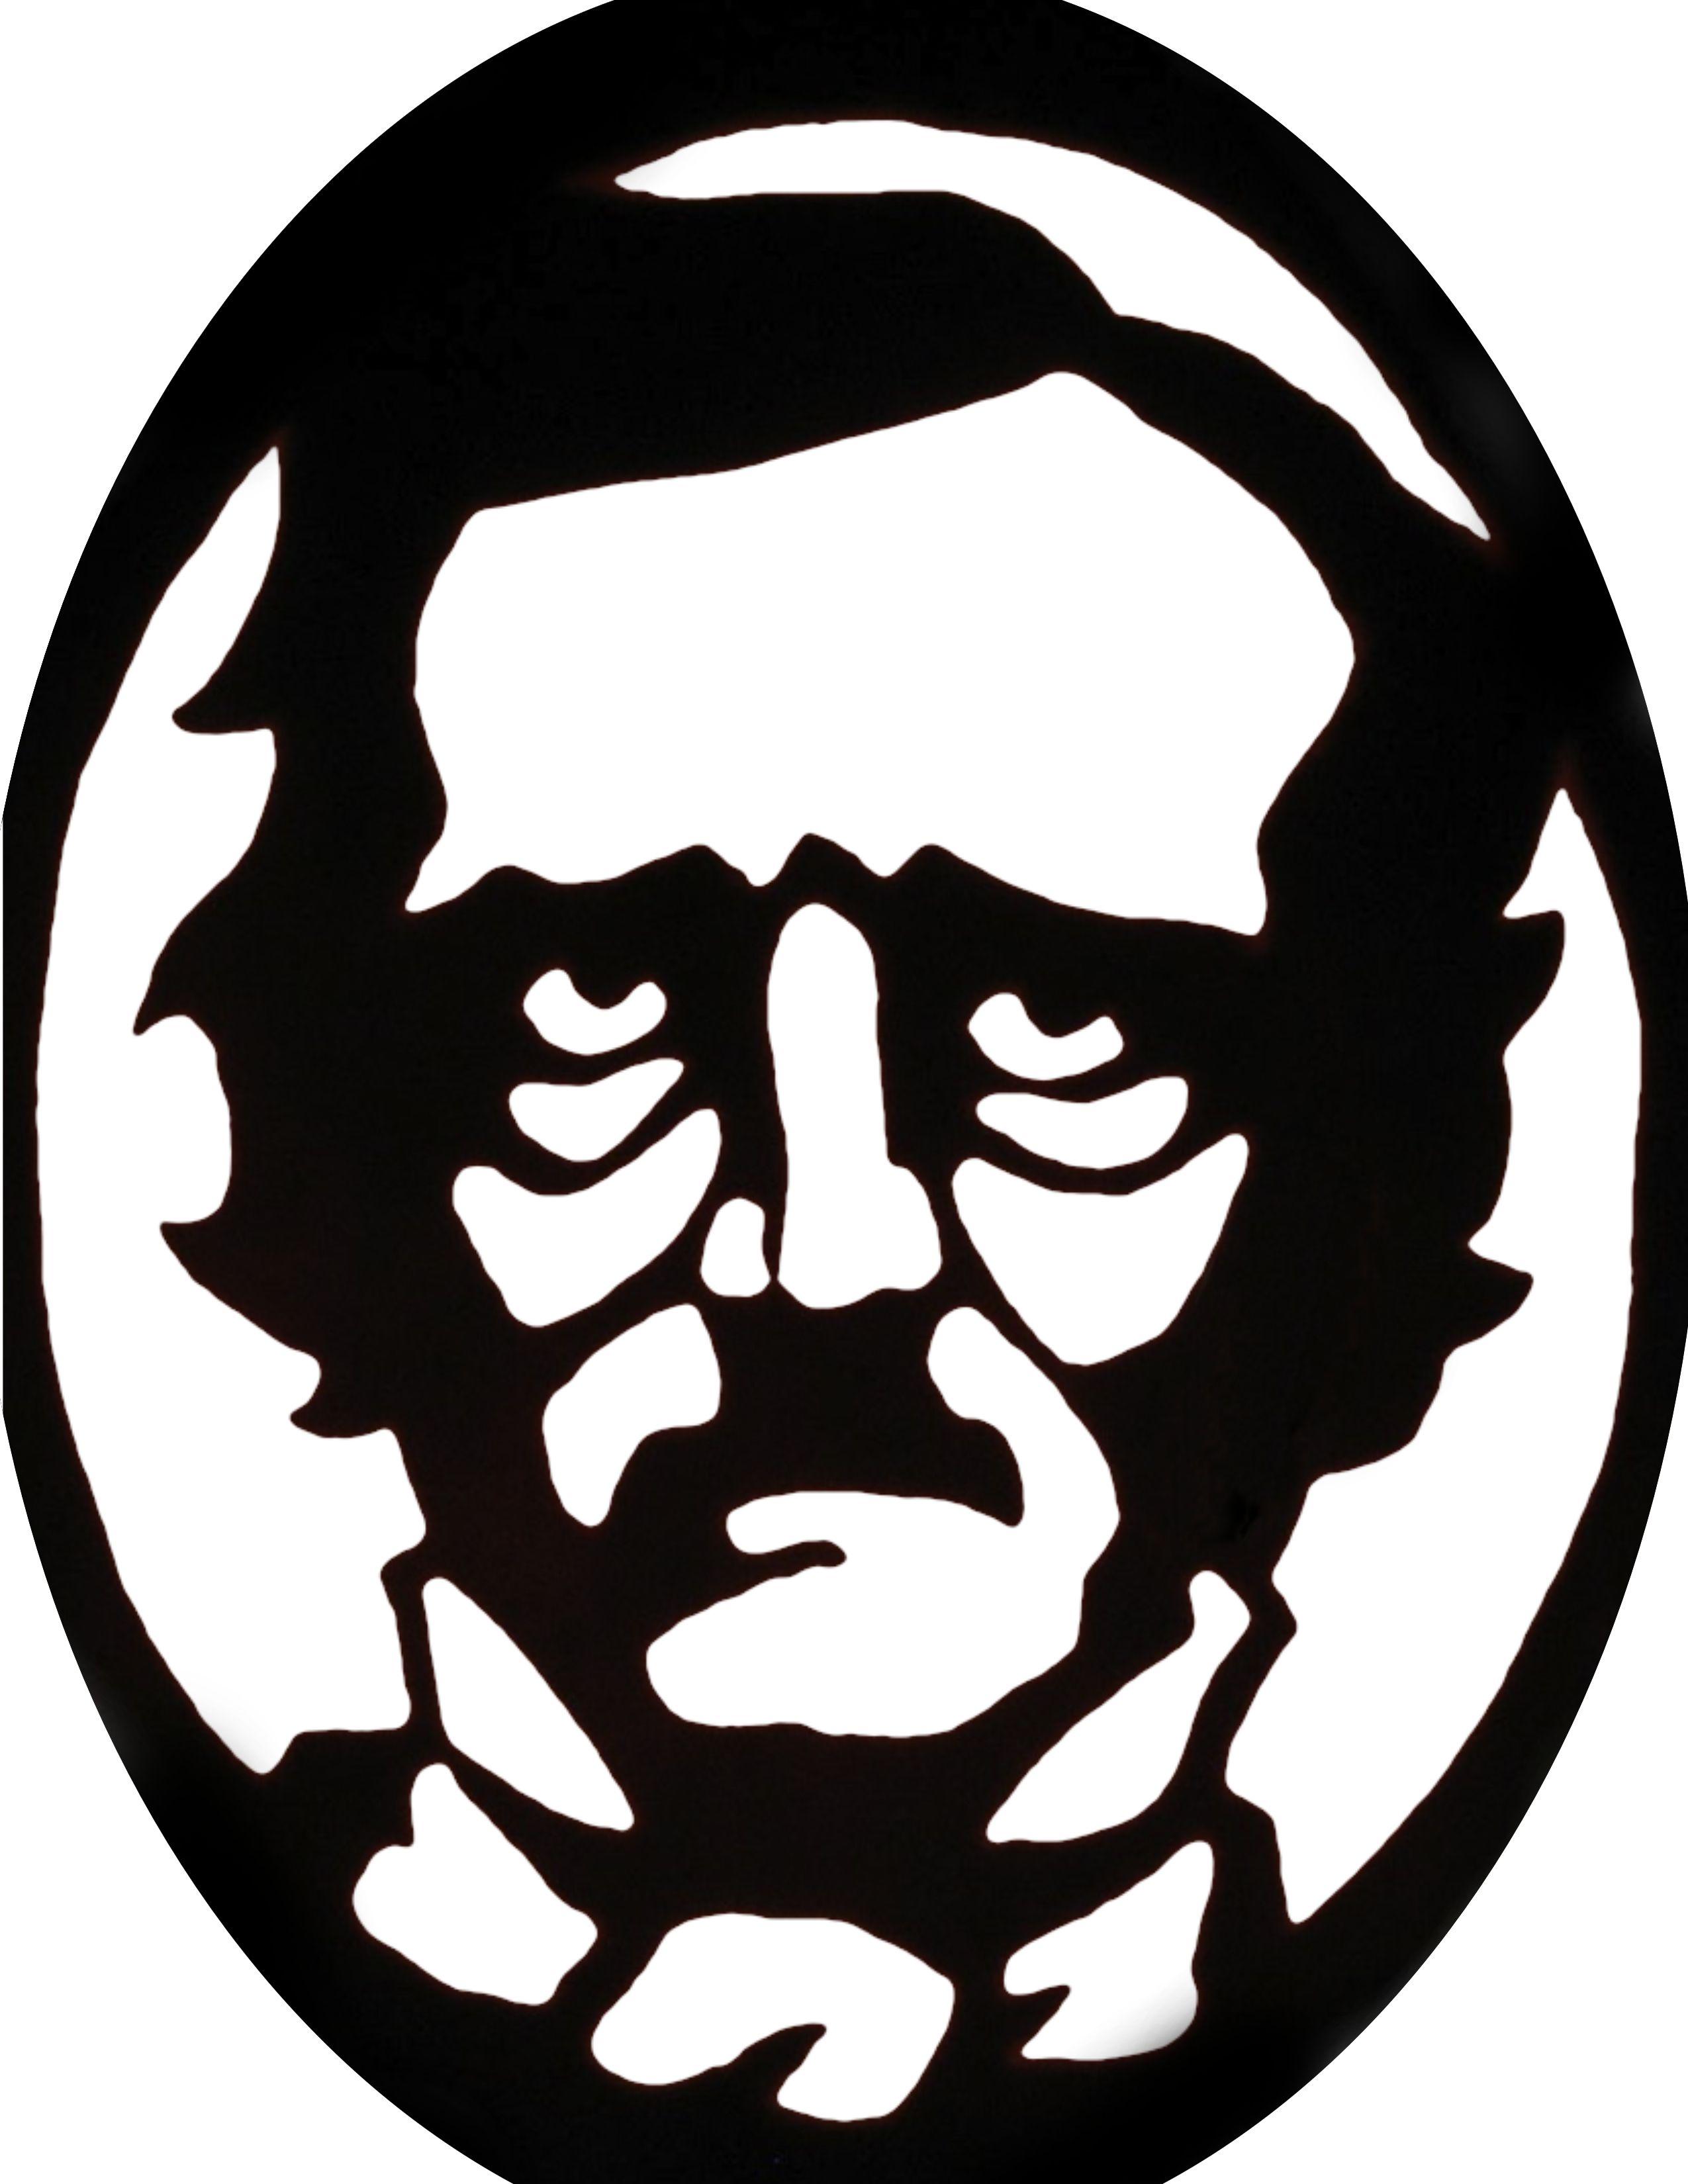 Edgar Allen Poe pumpkin carving stencil template. Poke tiny holes to ...